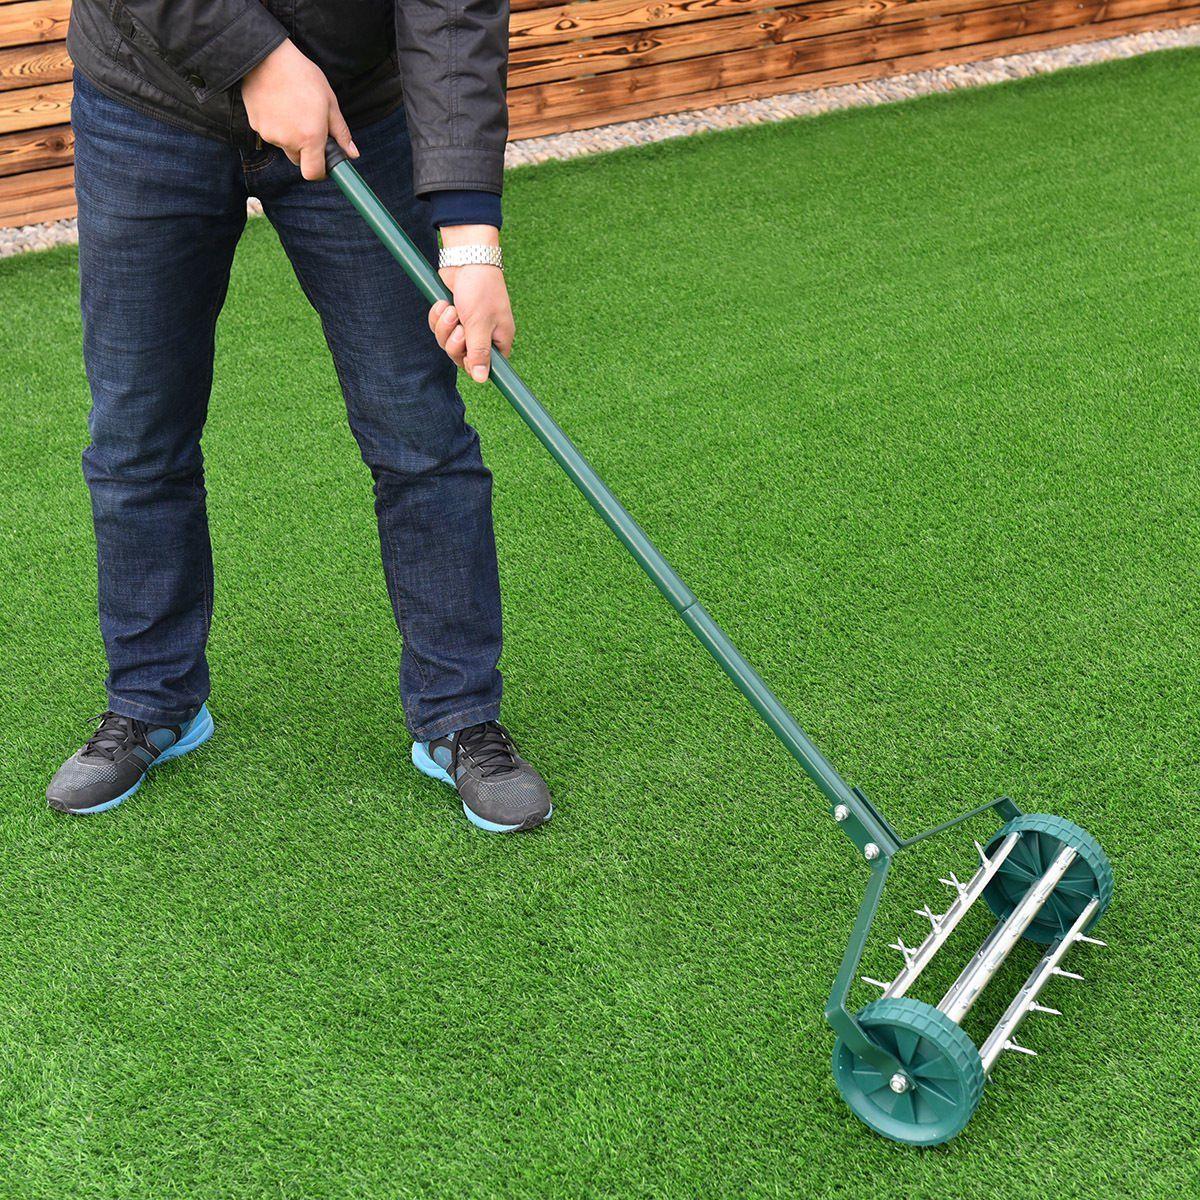 Gymax Rolling Garden Lawn Aerator Roller Home Grass Steel